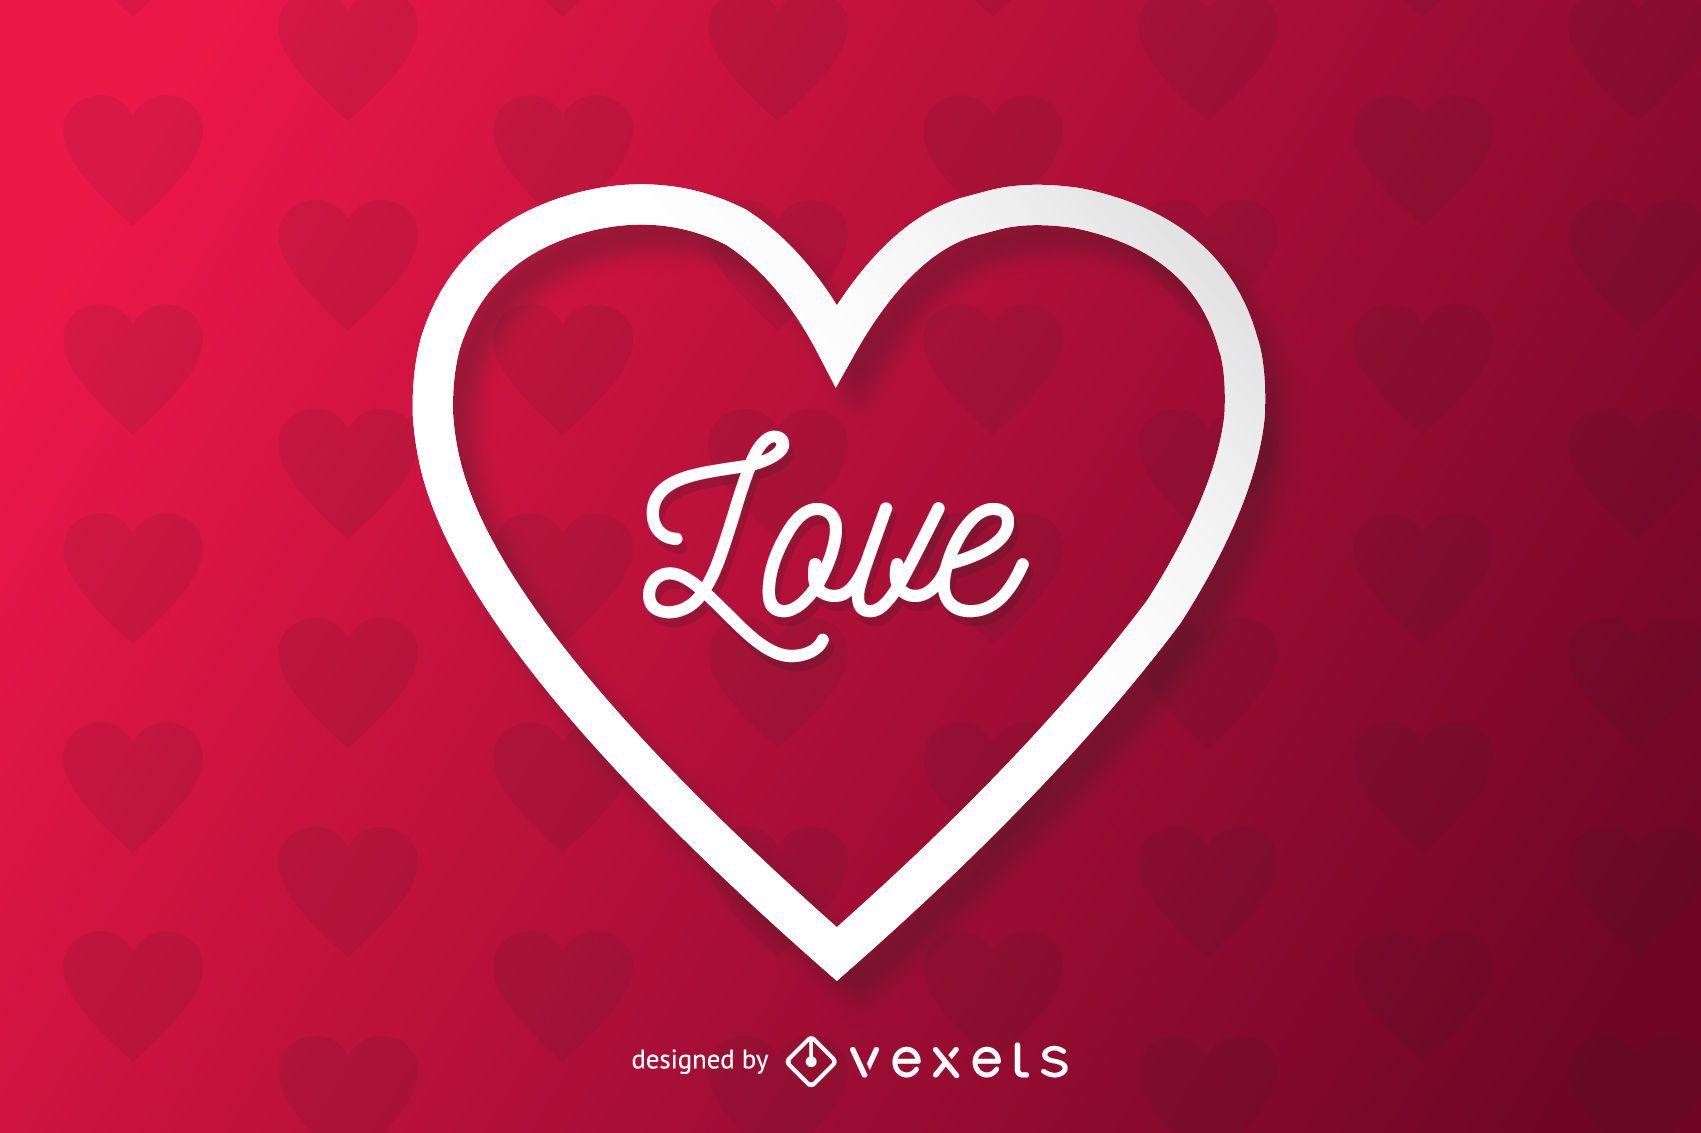 Paper Cut Heart Applique Valentine Background